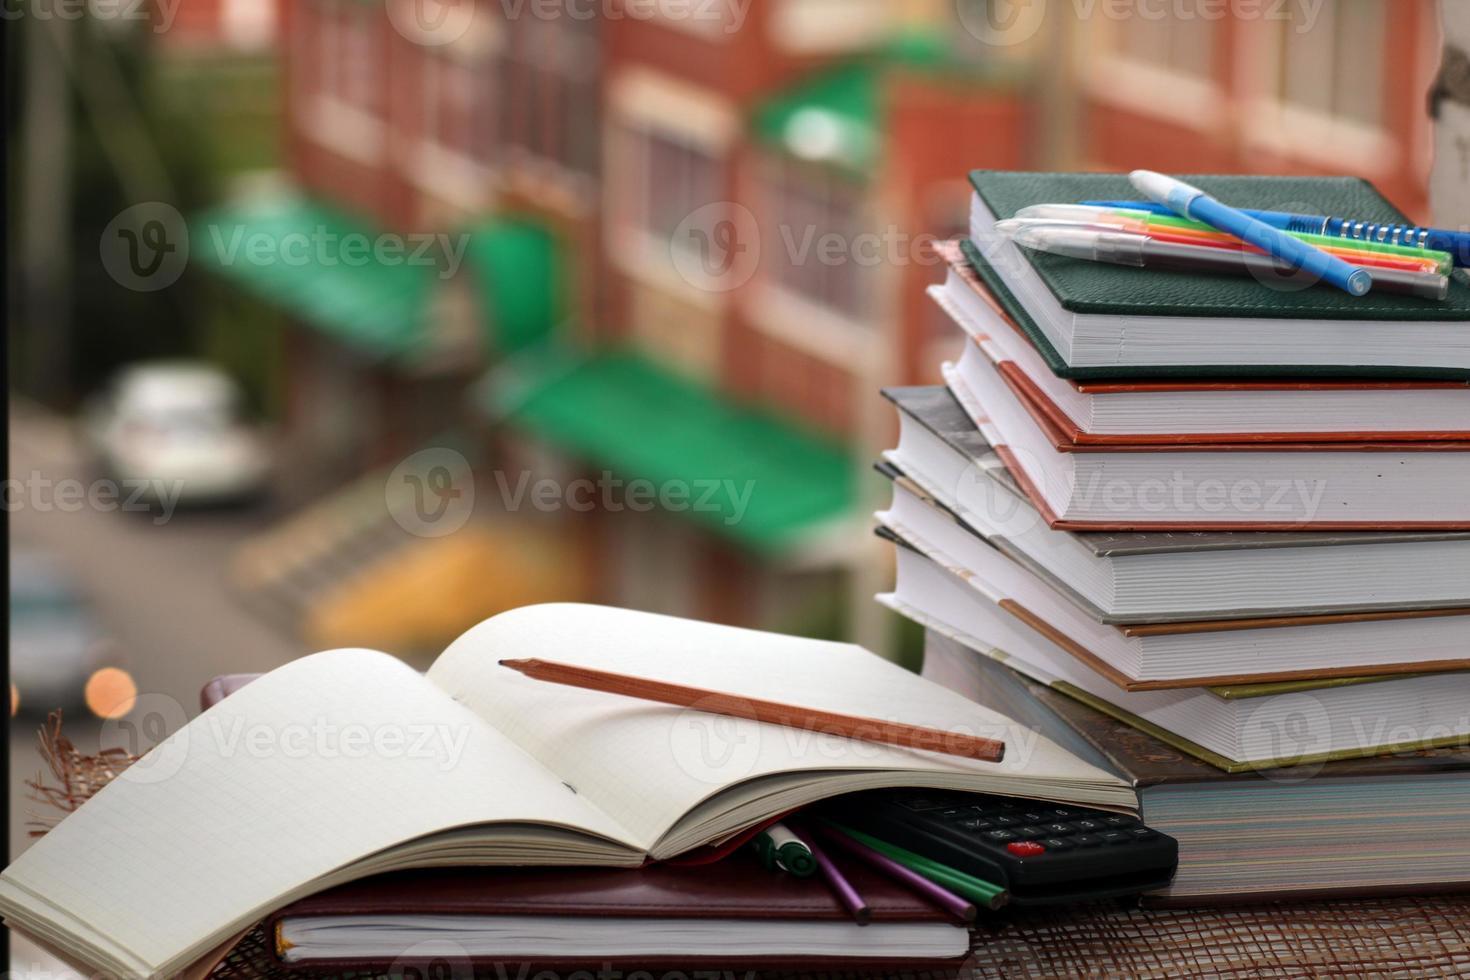 bolígrafo lápiz libros de texto de estudio foto